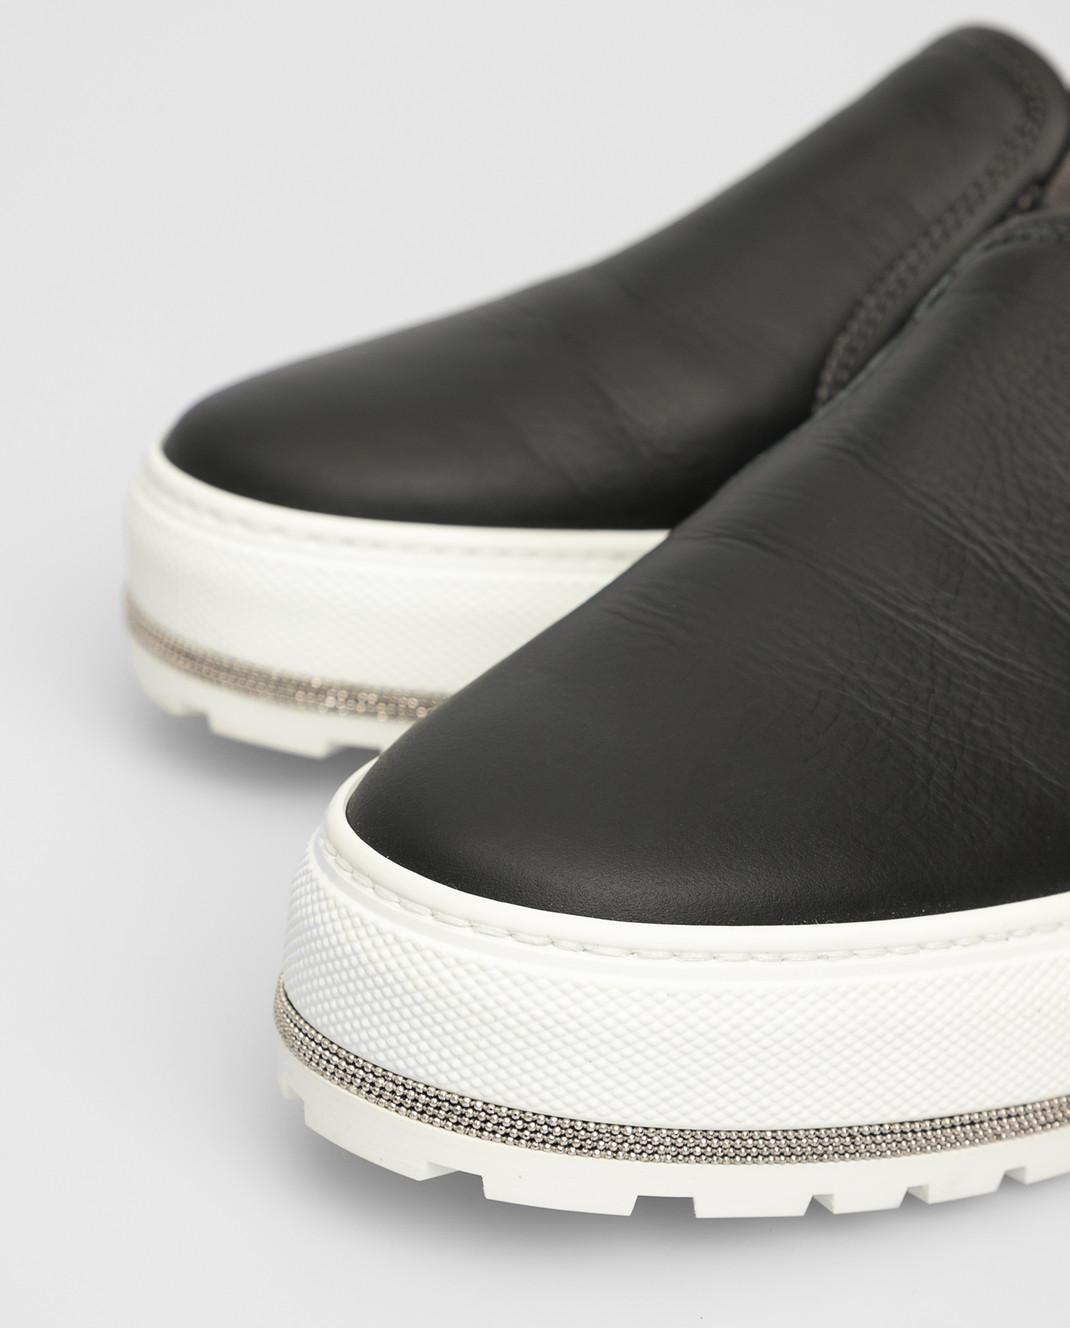 Brunello Cucinelli Черные кожаные слипоны MZDISG011P изображение 5